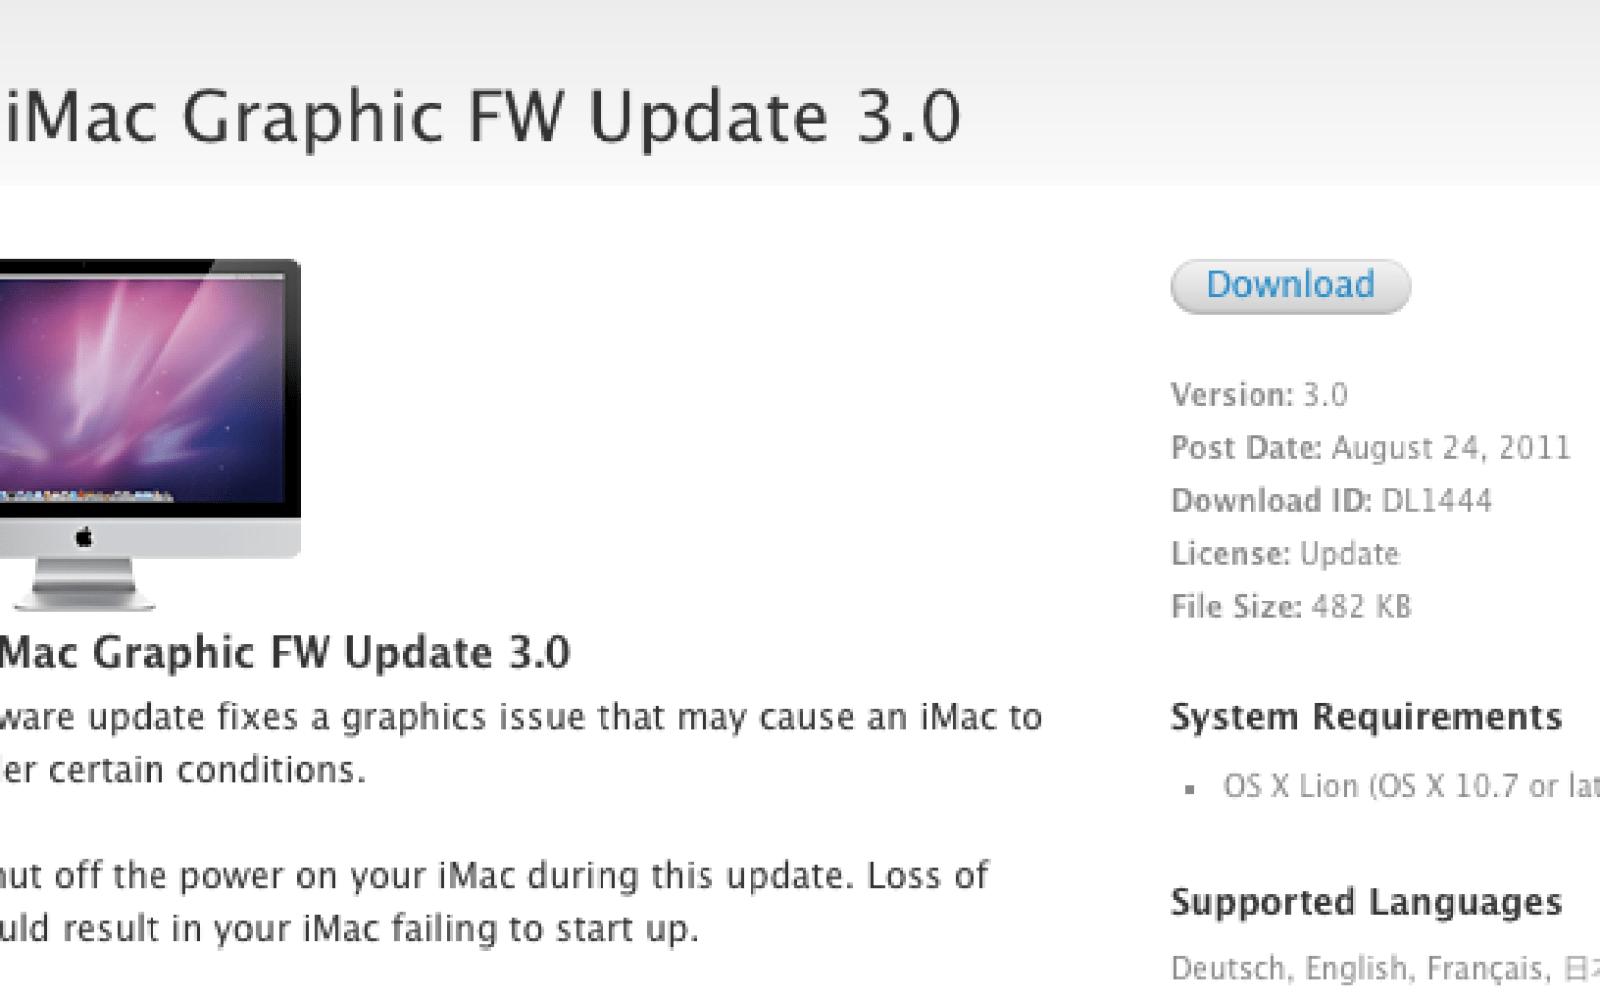 Apple fixes Lion video lock-ups on iMacs, improves hardware support